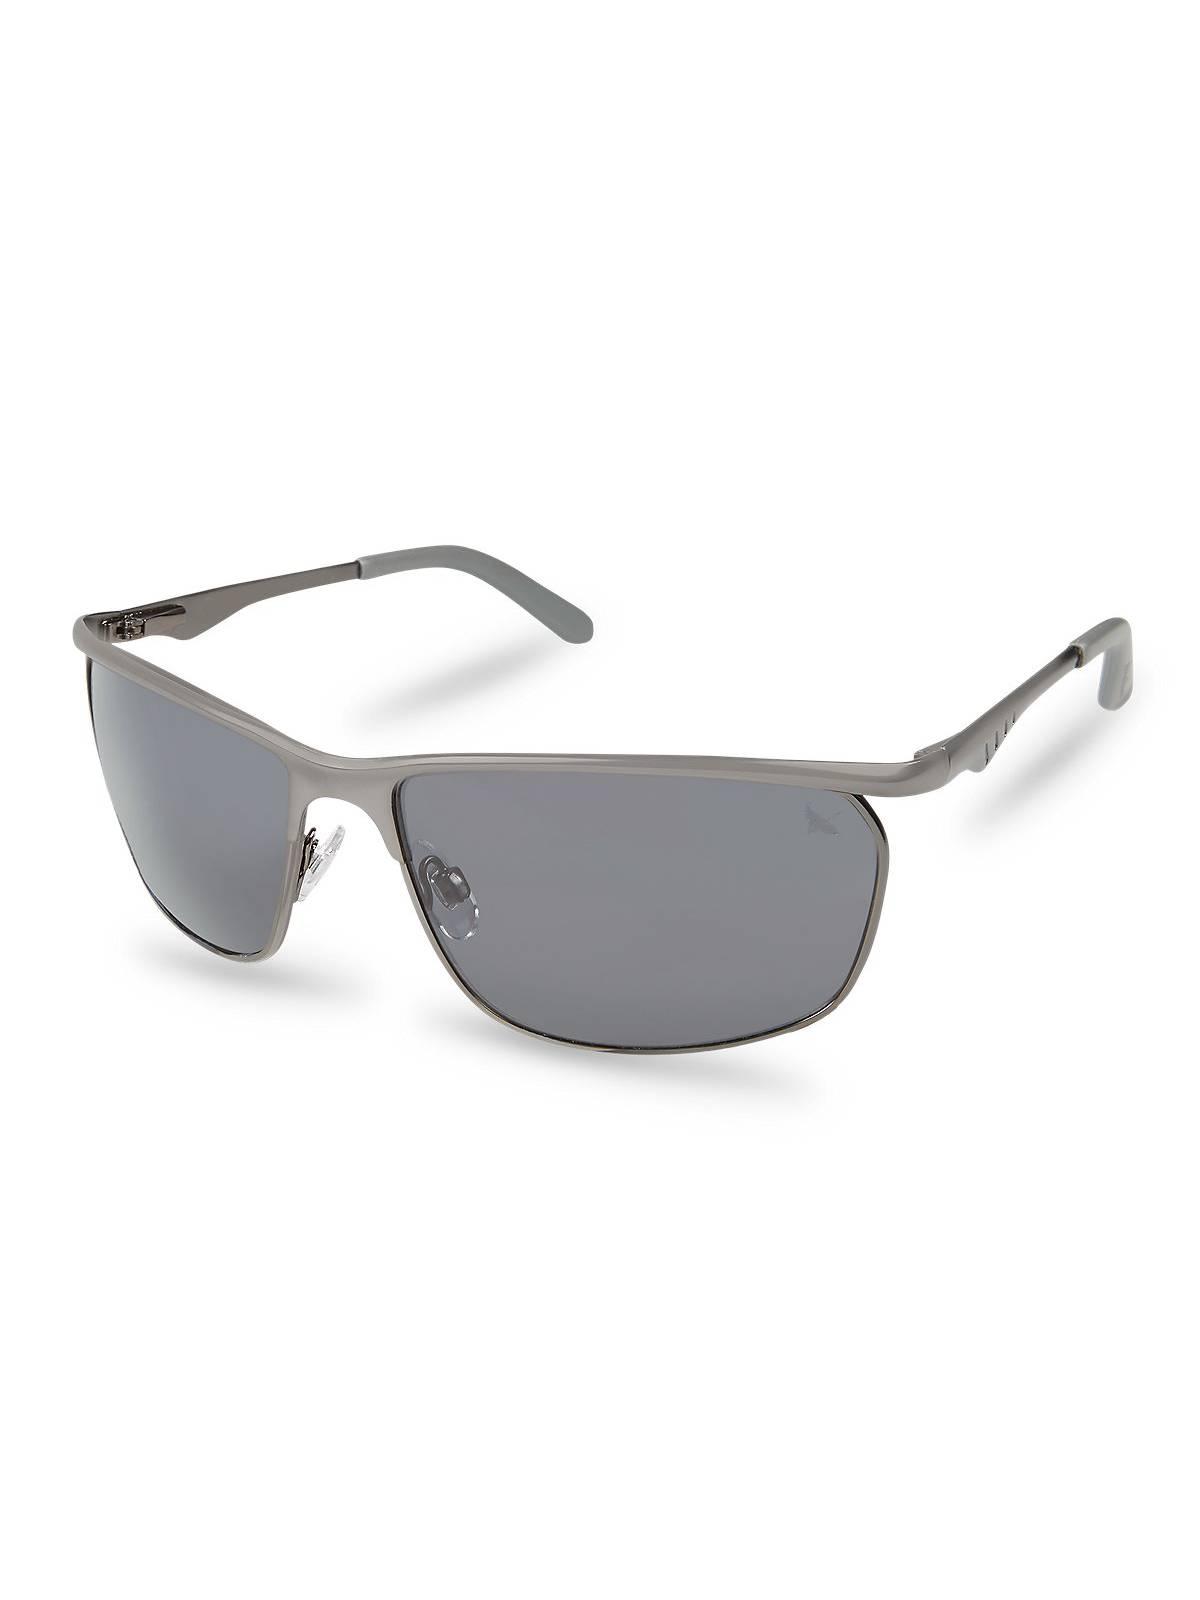 b5e96a0c2862 Eddie-Bauer-Unisex-Adult-Eastlake-Polarized-Sunglasses thumbnail 7